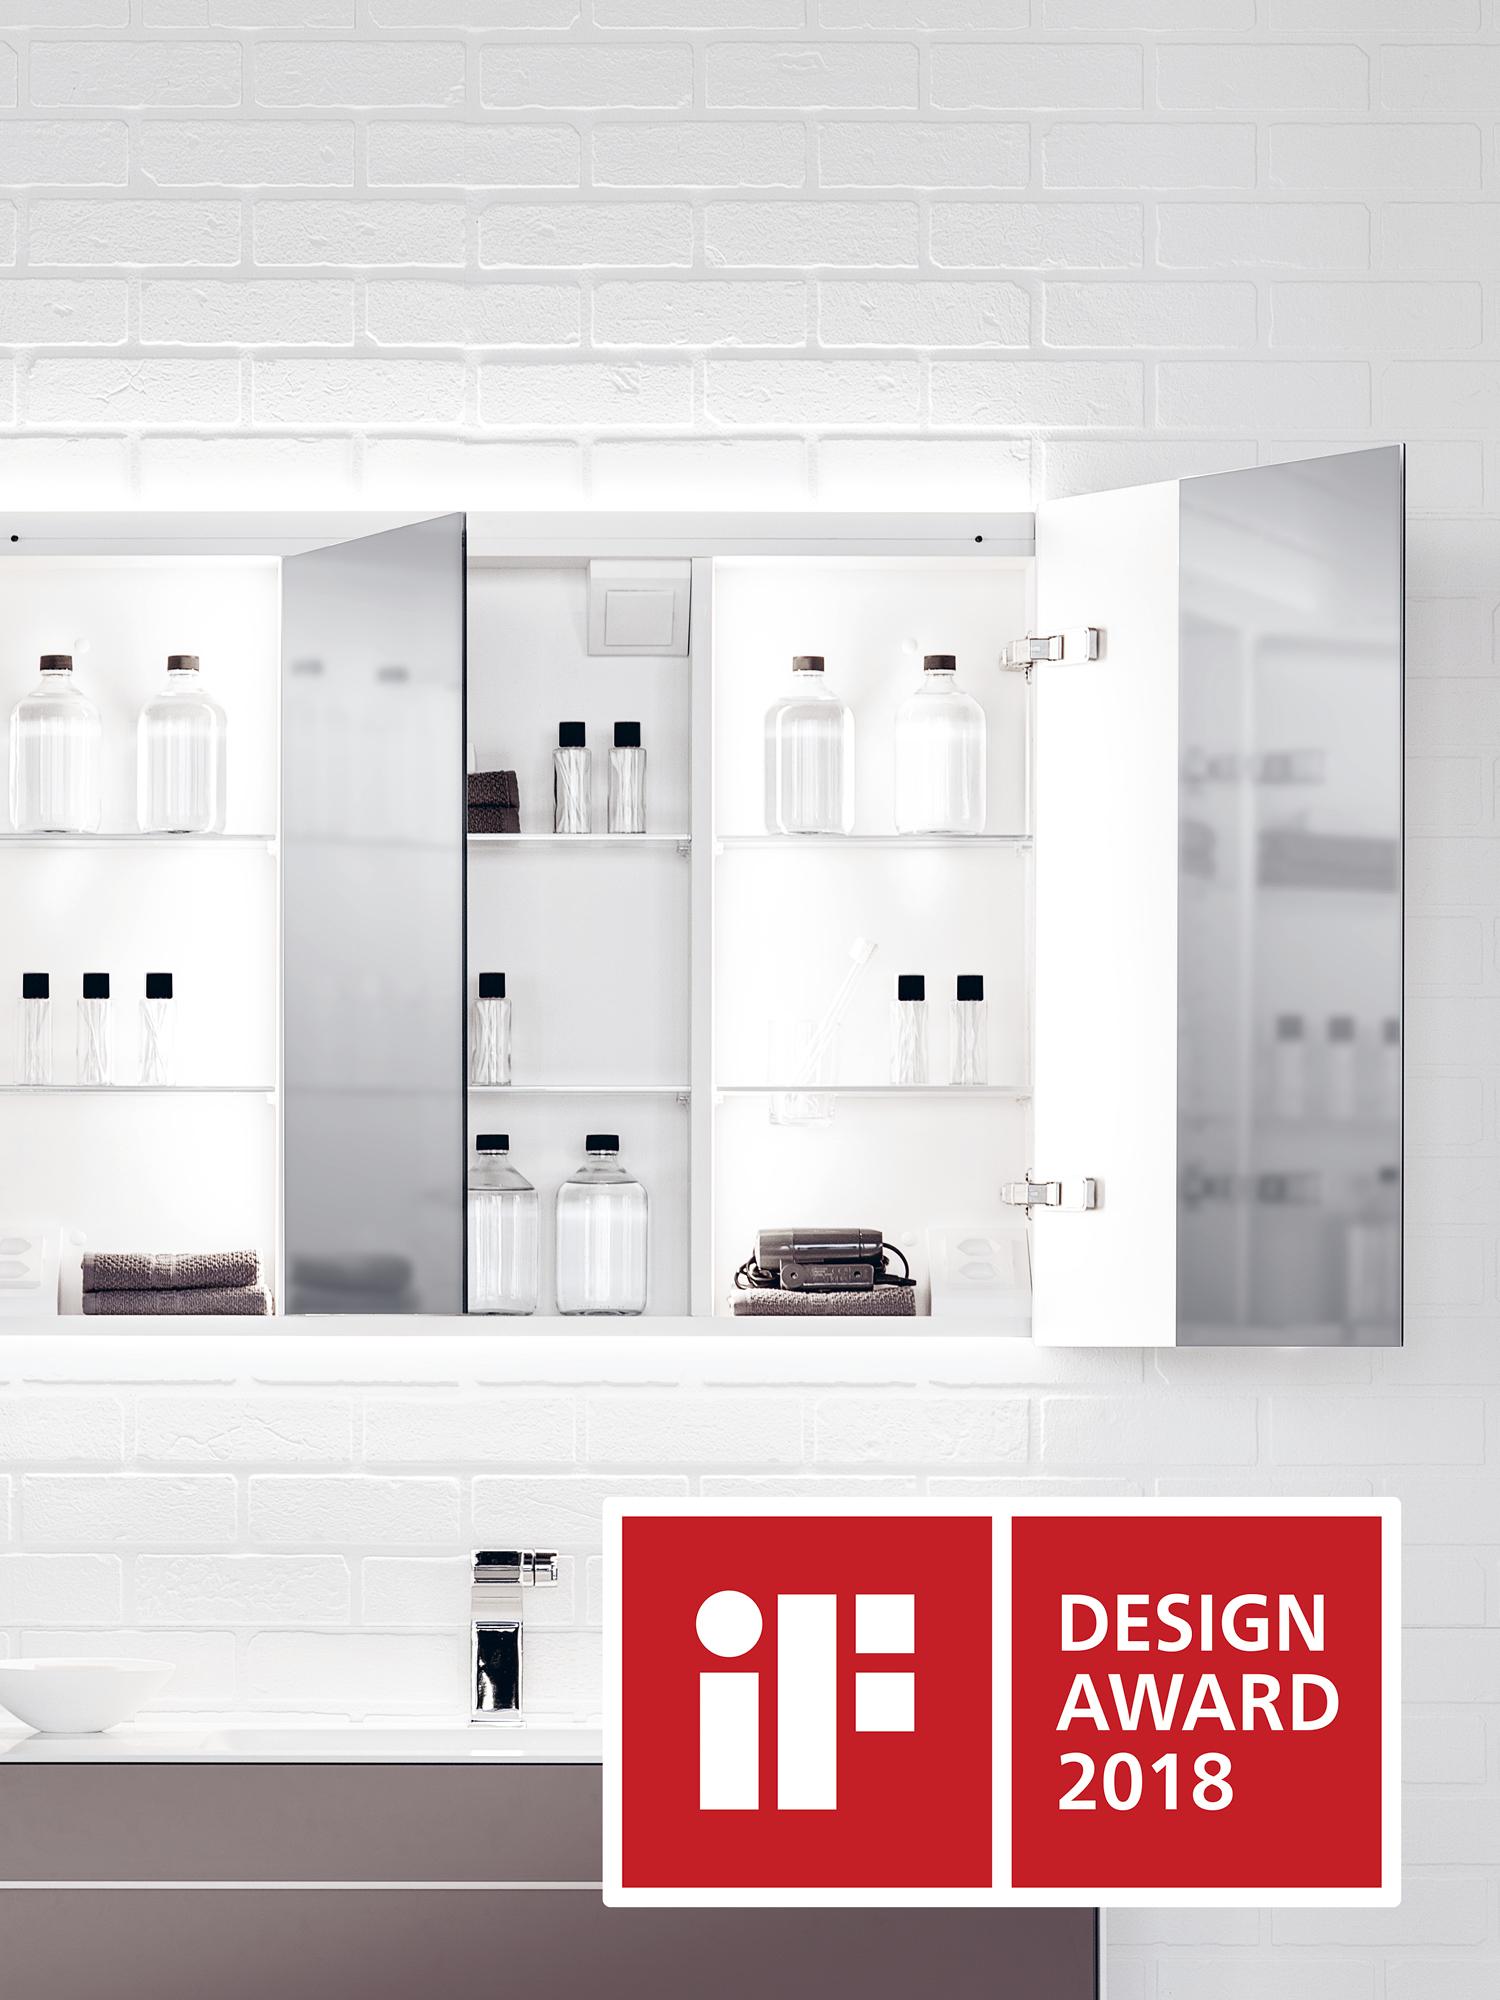 Spiegelschrank reflect erhält iF Design Award